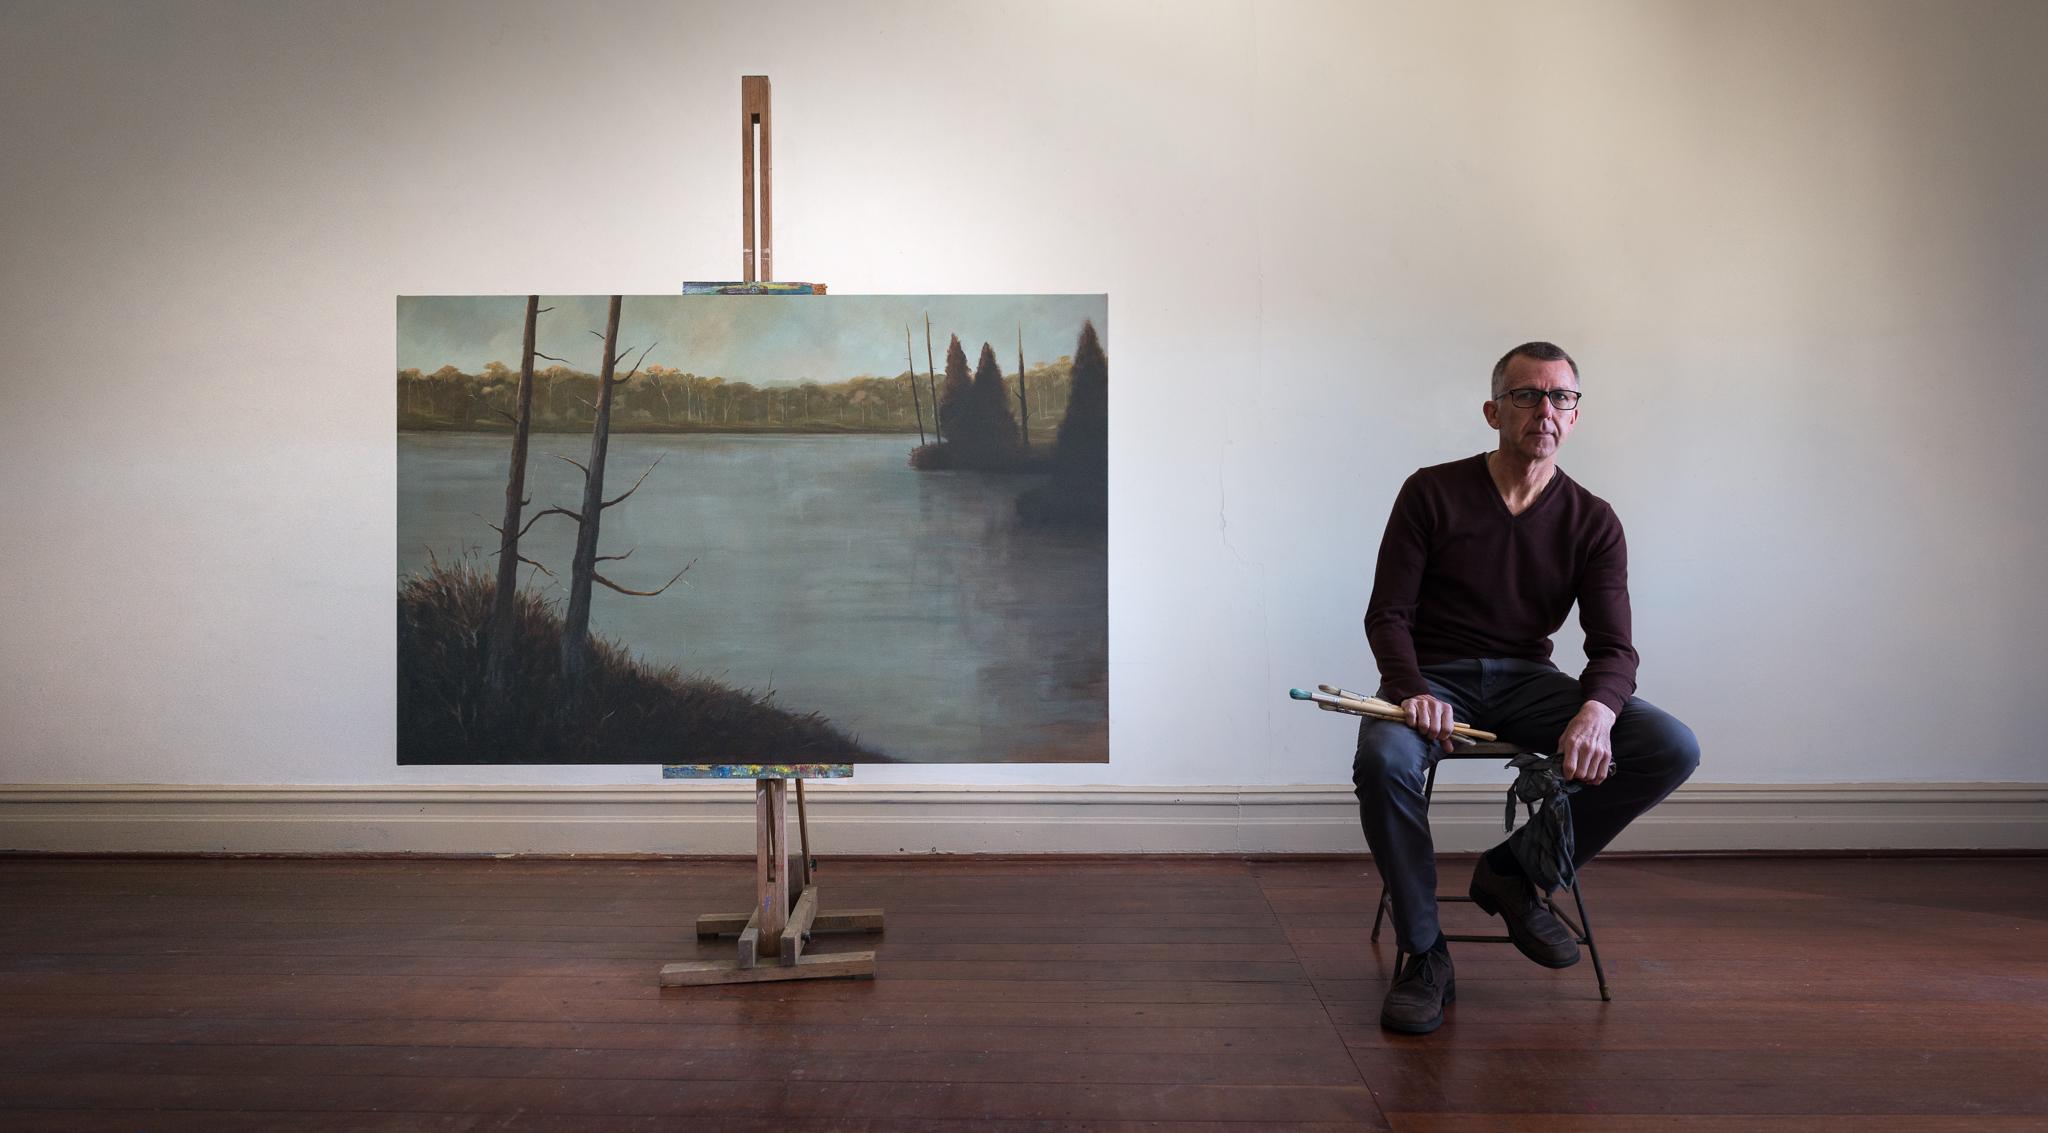 Artist David Green